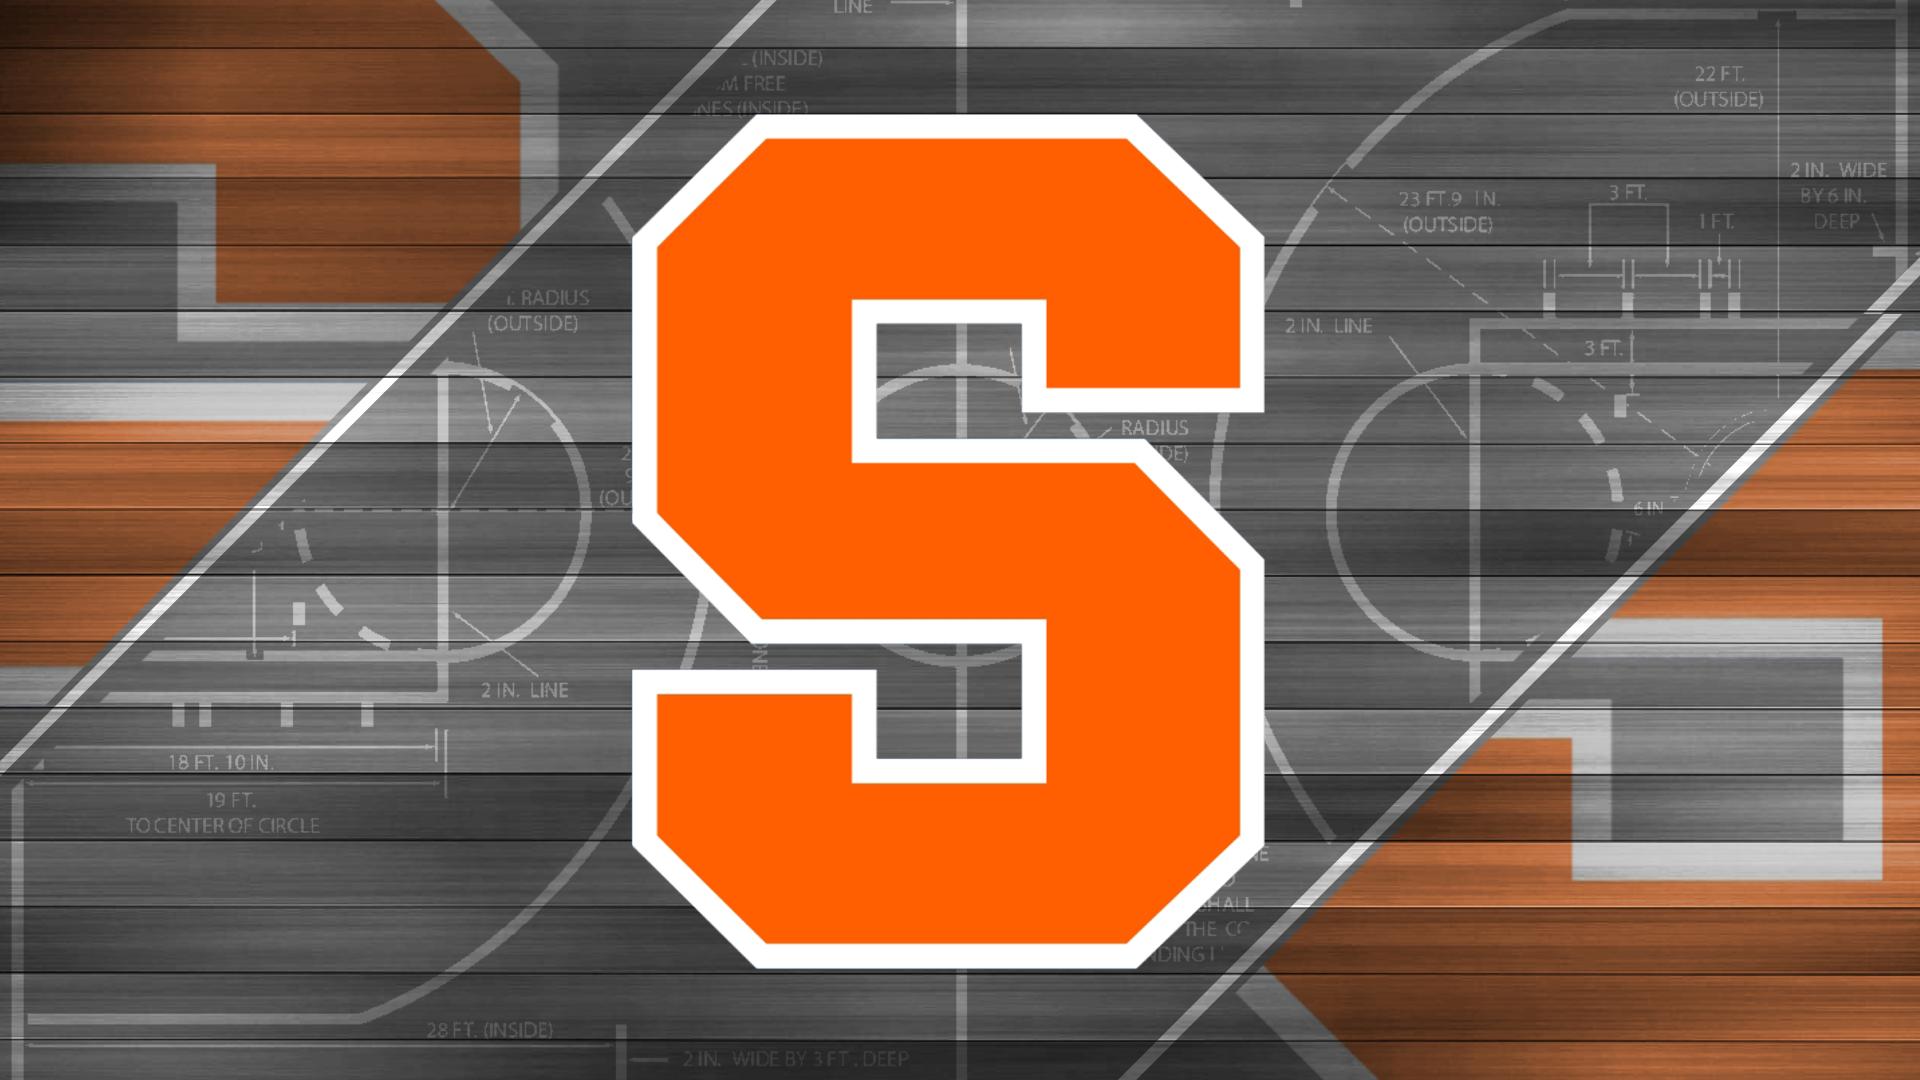 Download Syracuse Orange Wallpaper Gallery 1920x1080